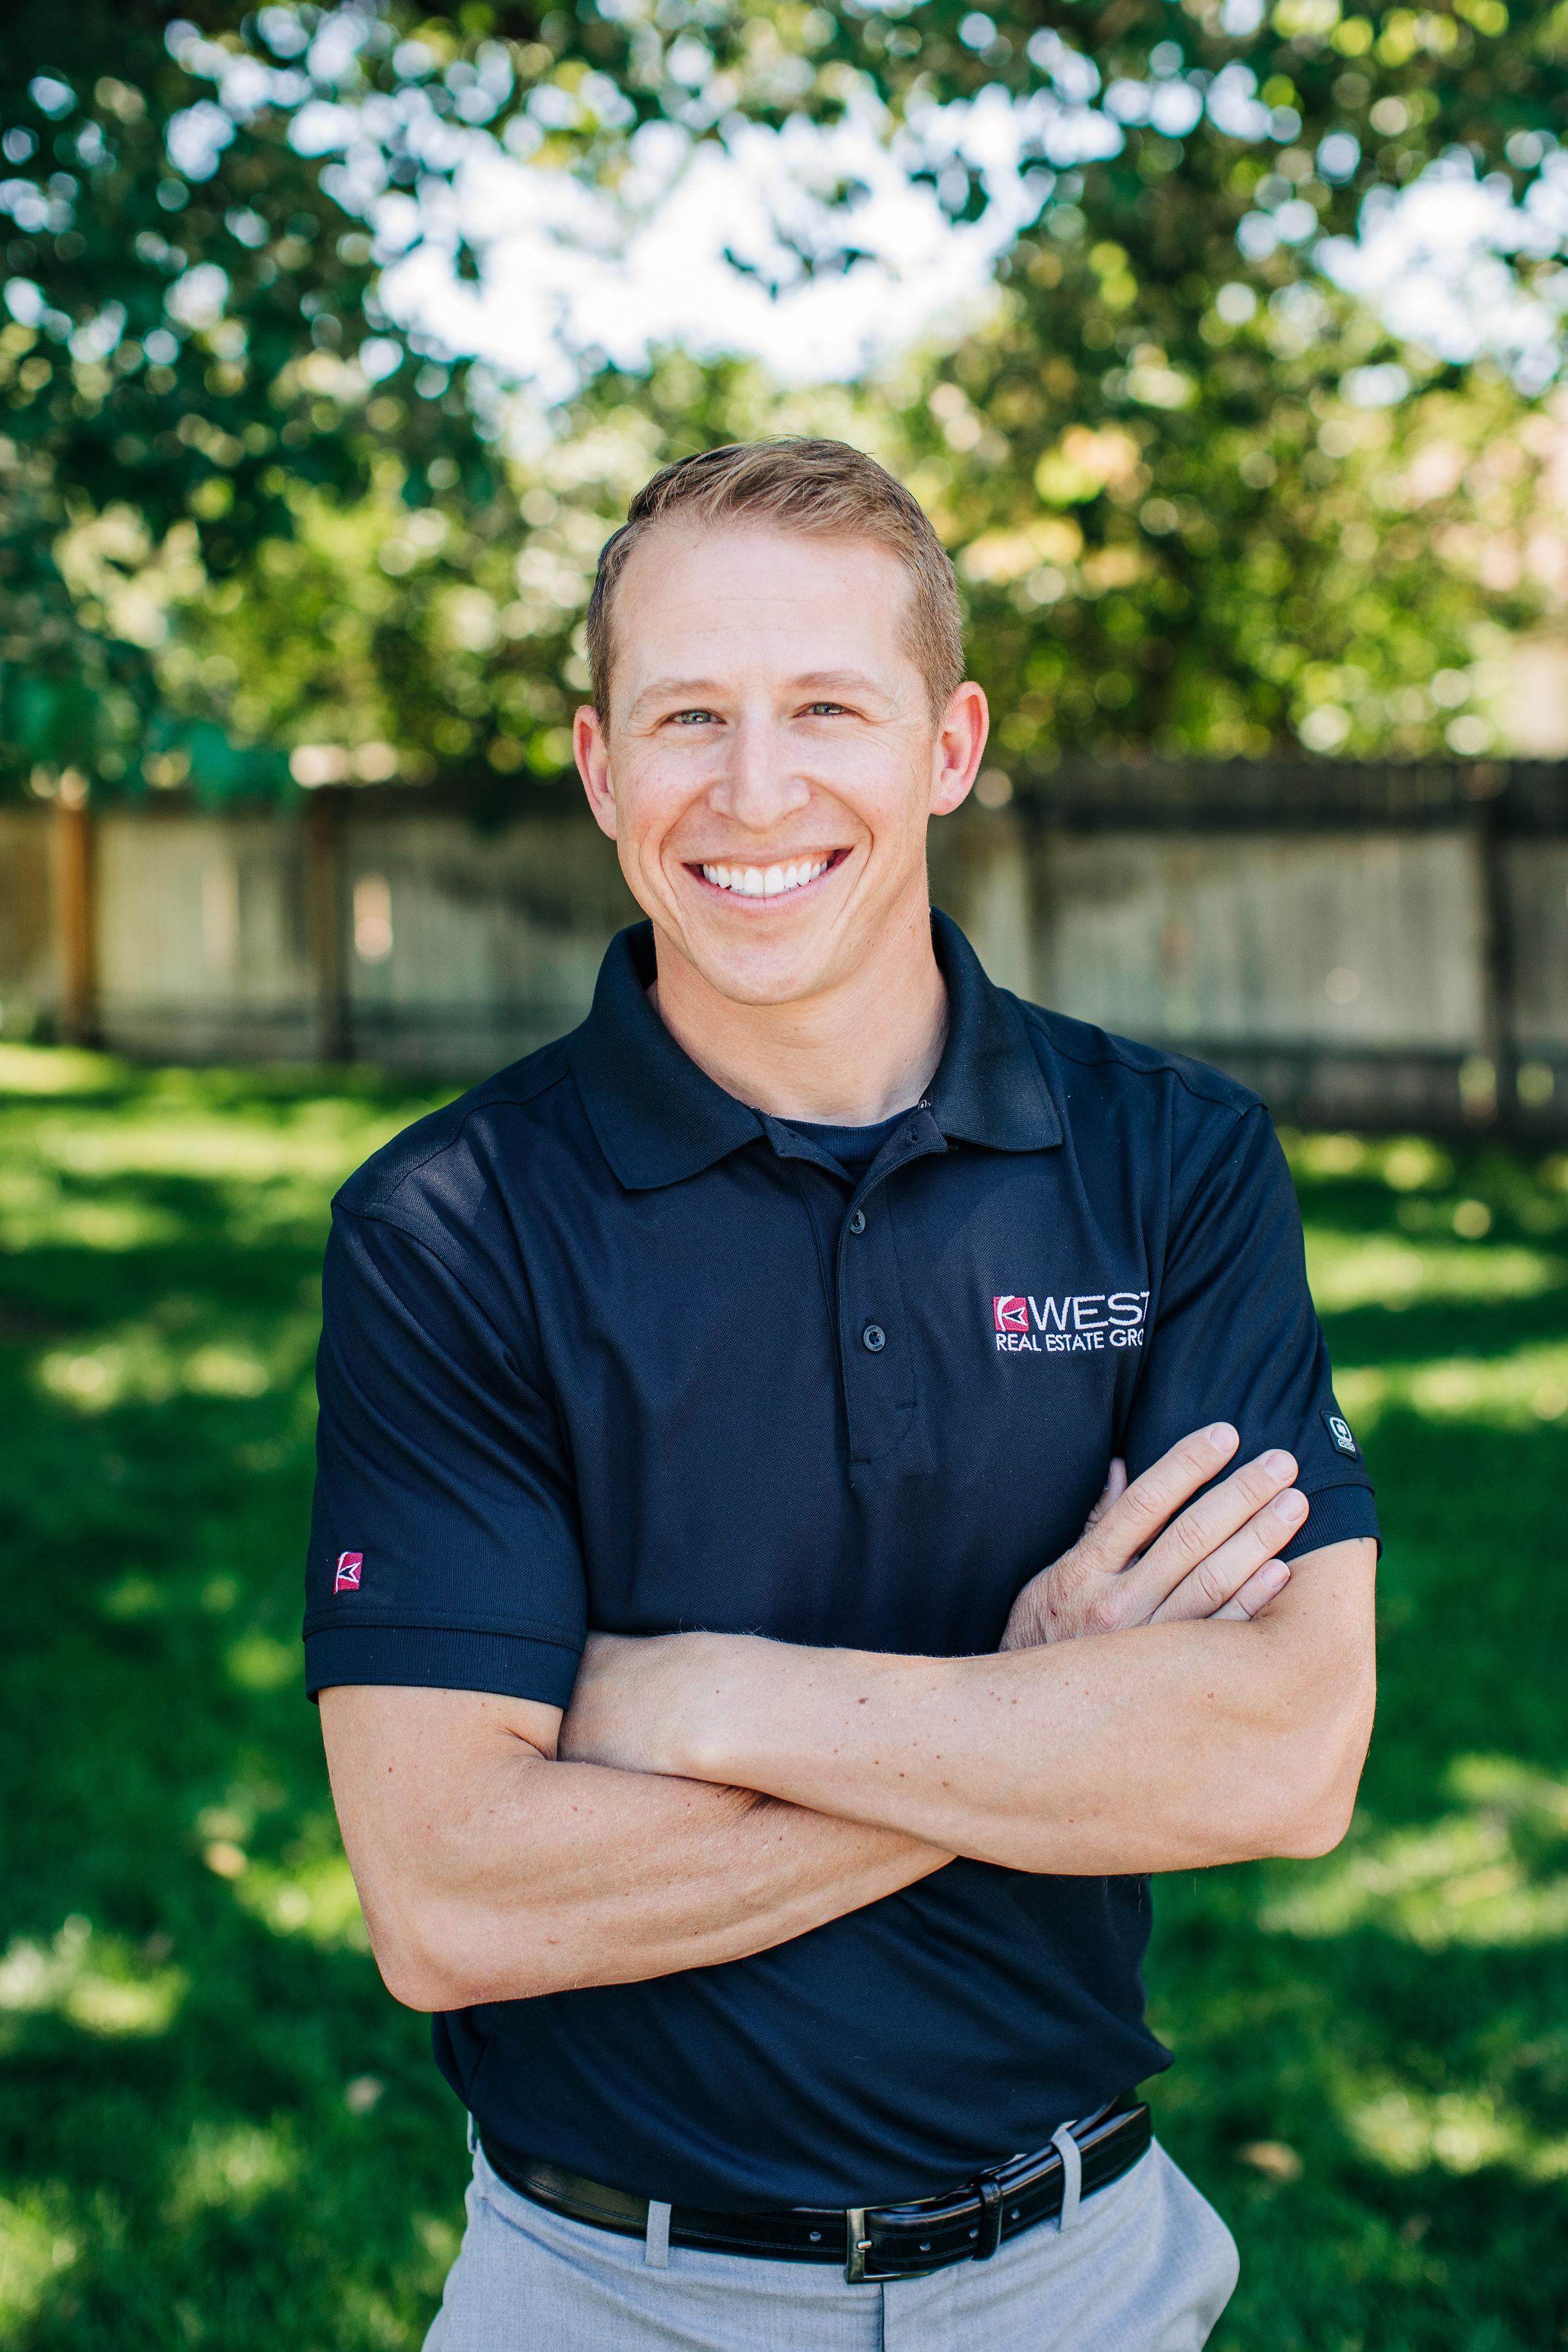 Meet John West - West Real Estate Group